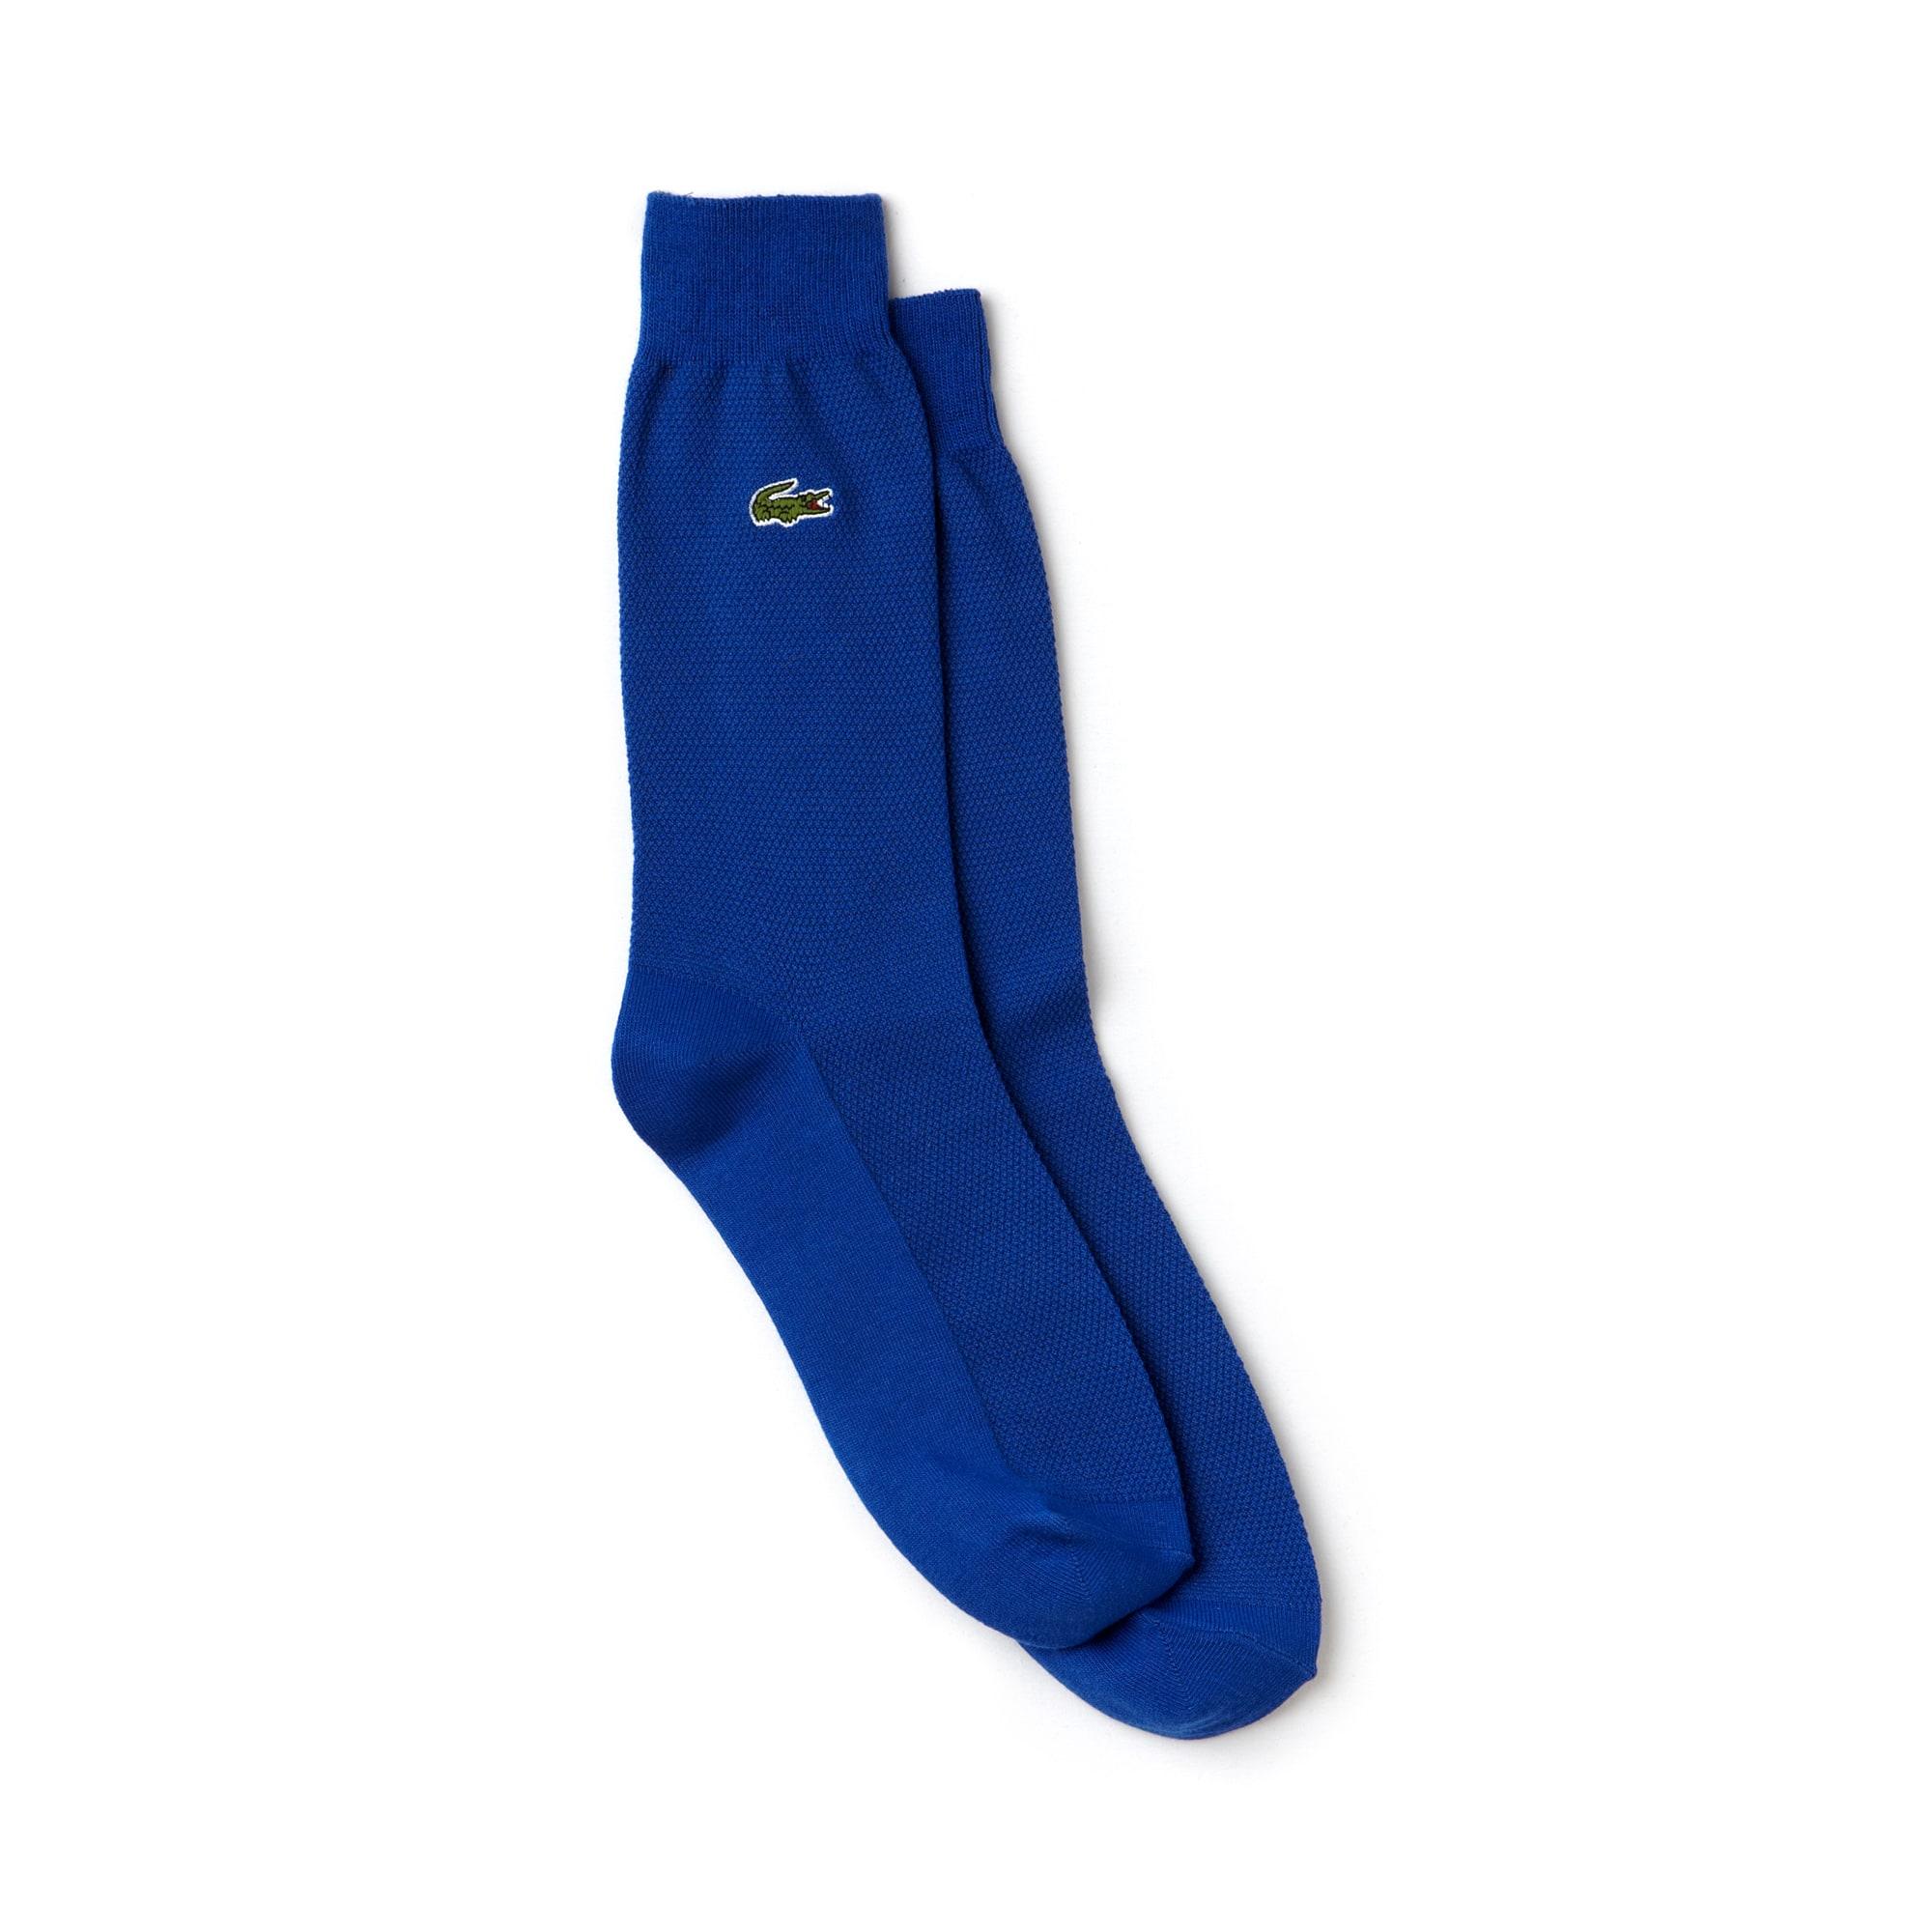 Men's Socks in stretch cotton jersey